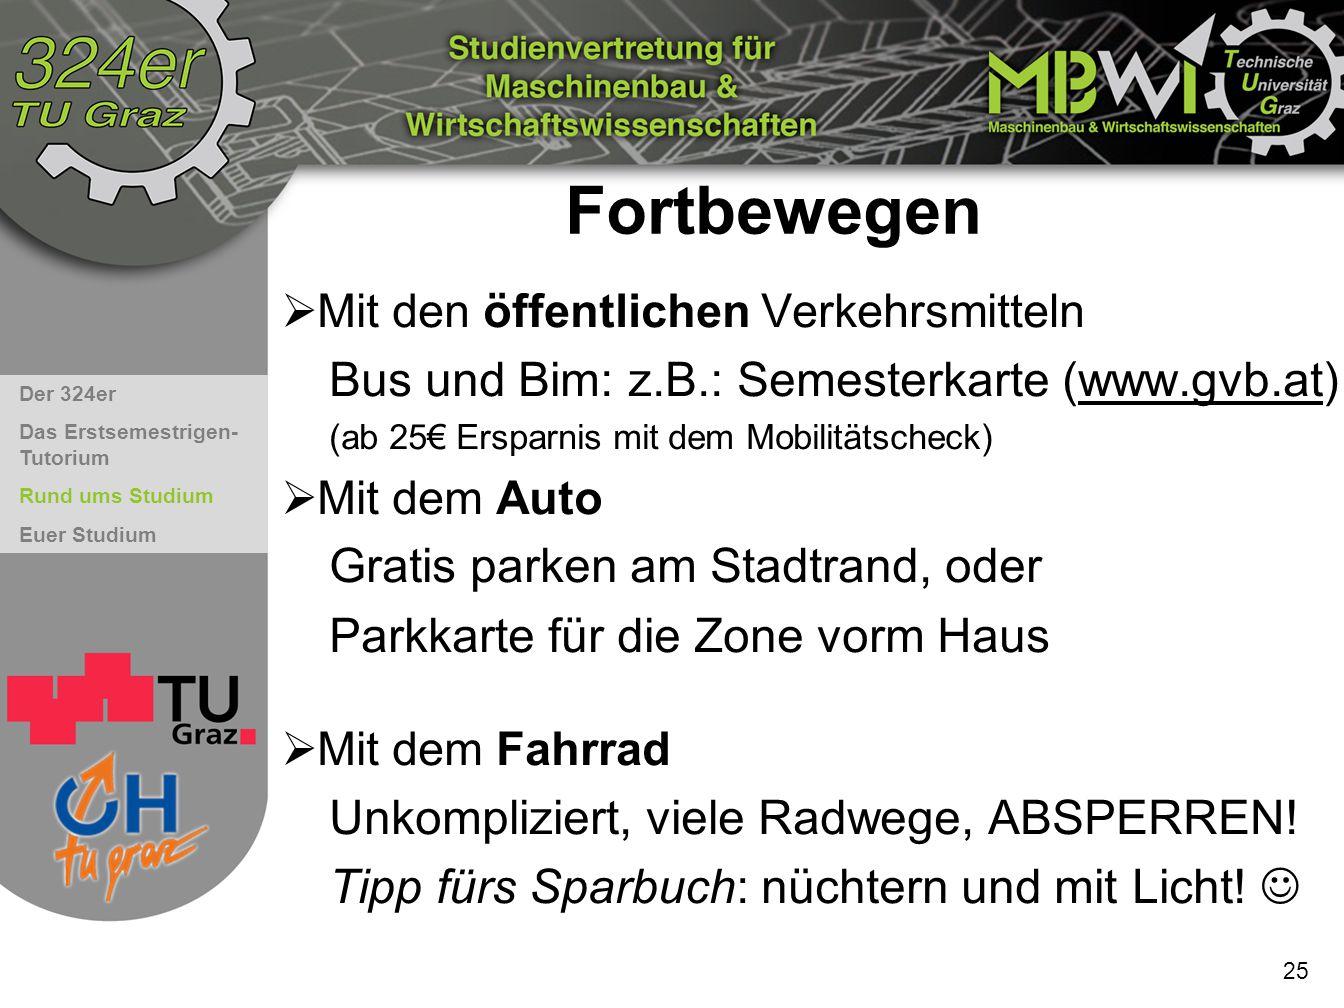 Fortbewegen Bus und Bim: z.B.: Semesterkarte (www.gvb.at)